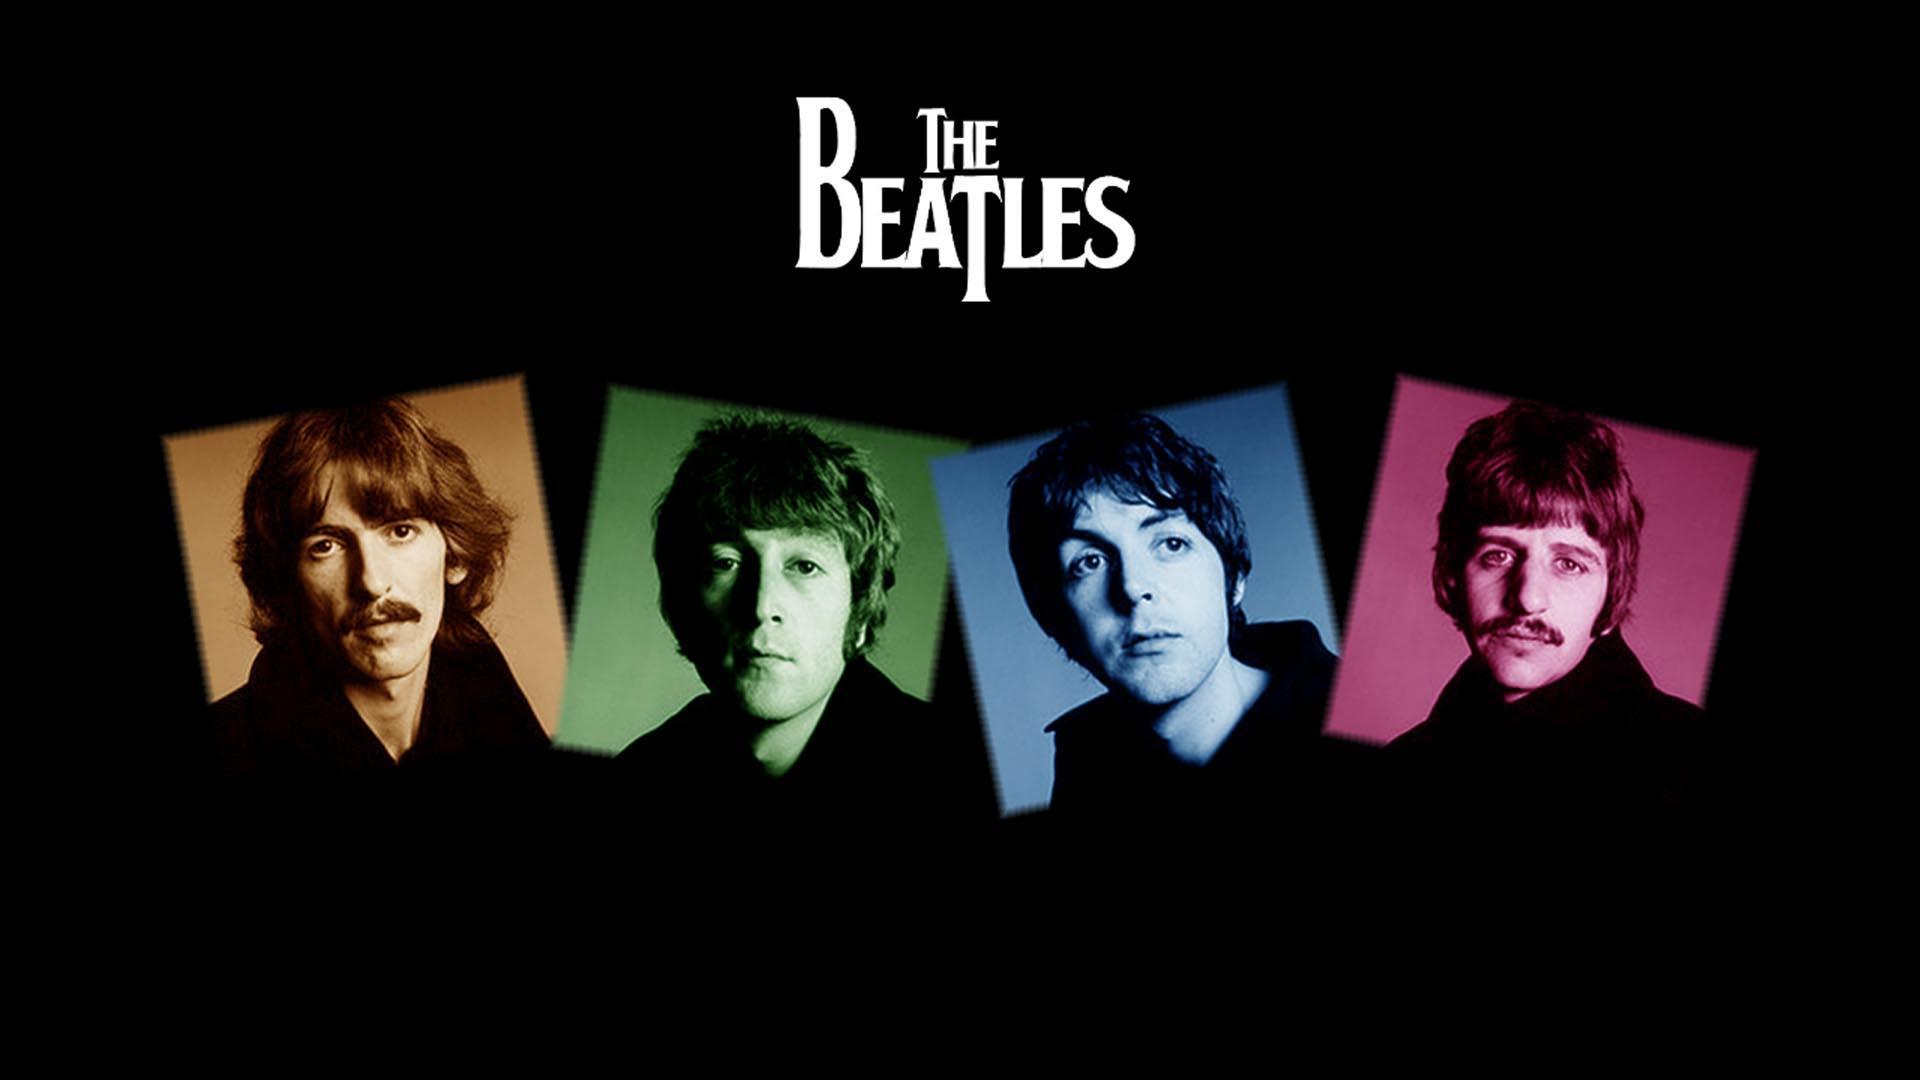 The Beatles Polska: The Beatles w głosowaniu Top Wszech Czasów Trójki